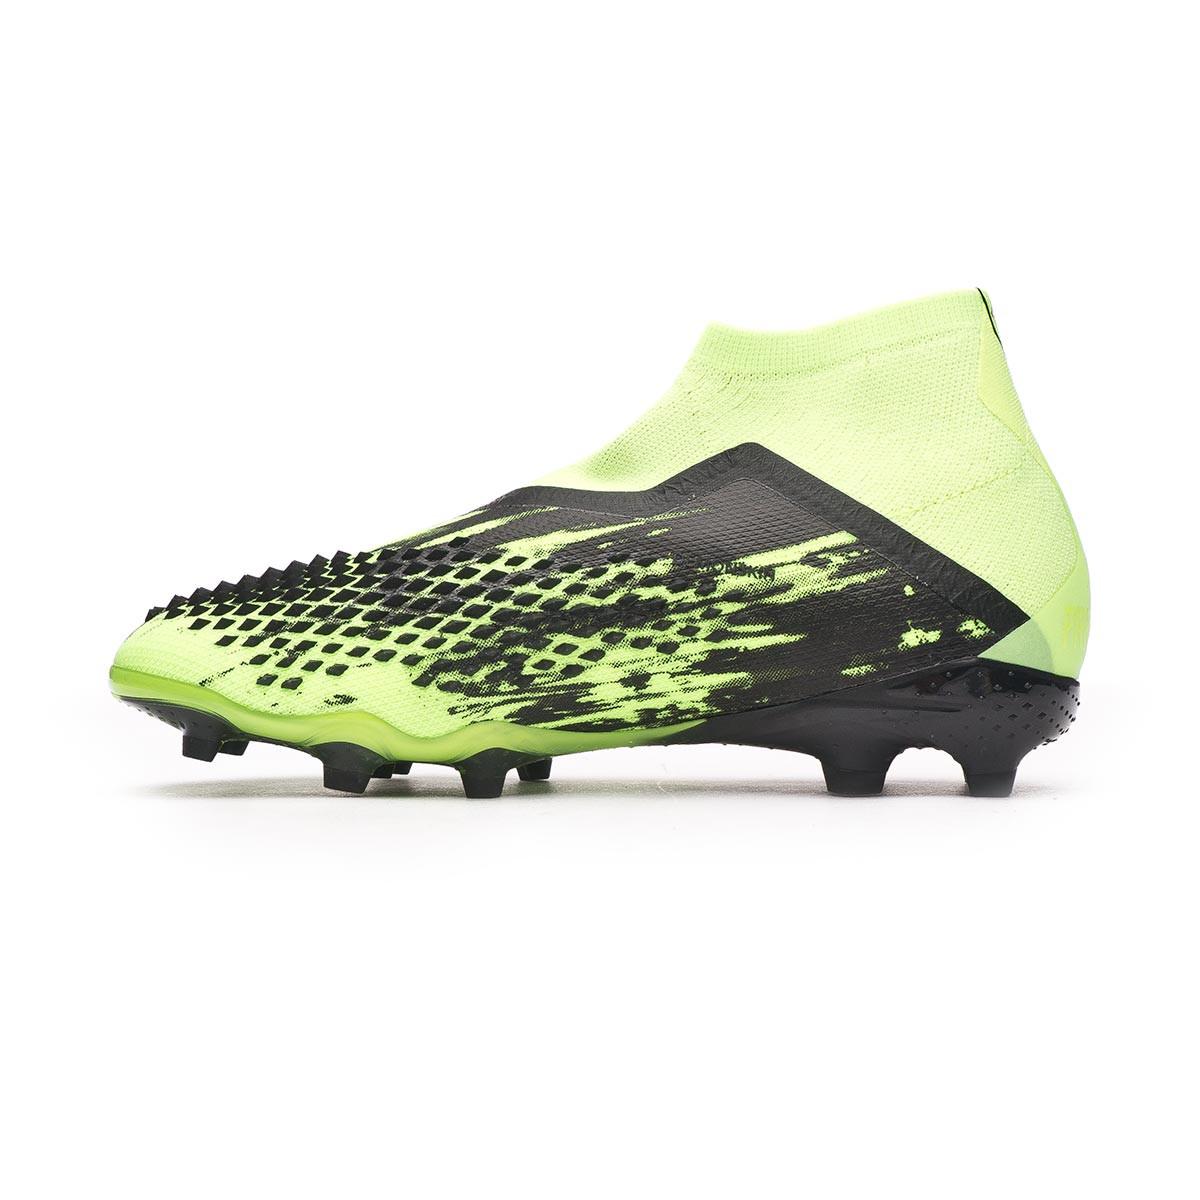 Perca abolir Deformación  Football Boots adidas Kids Predator Mutator 20+ FG Signal green-White-Core  black - Football store Fútbol Emotion